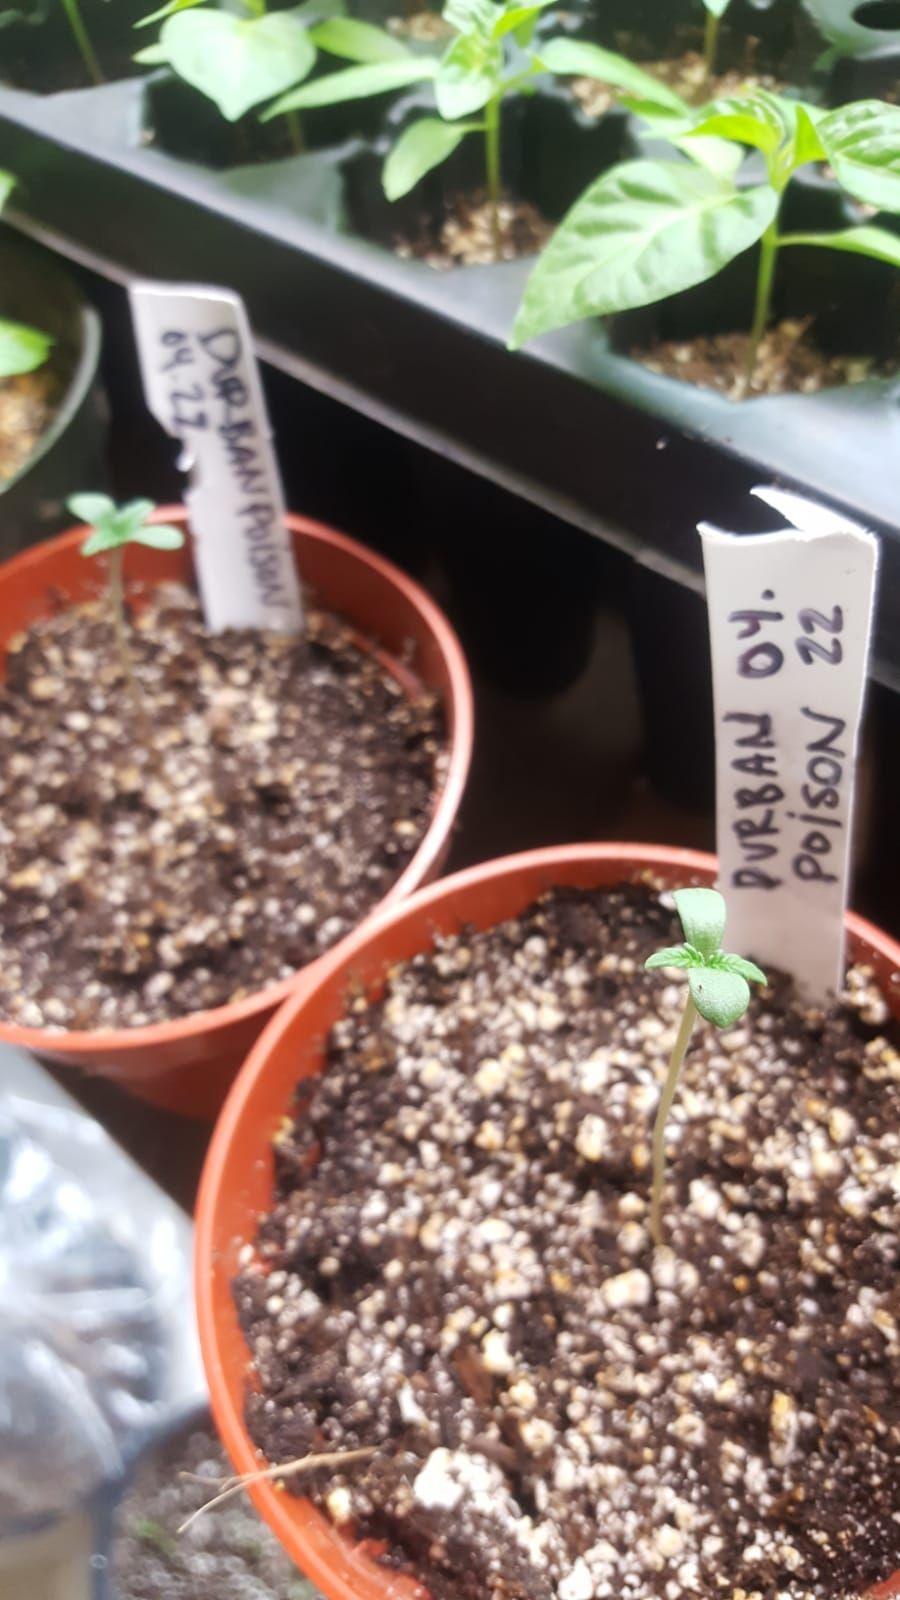 Pin on Grow Cannabis